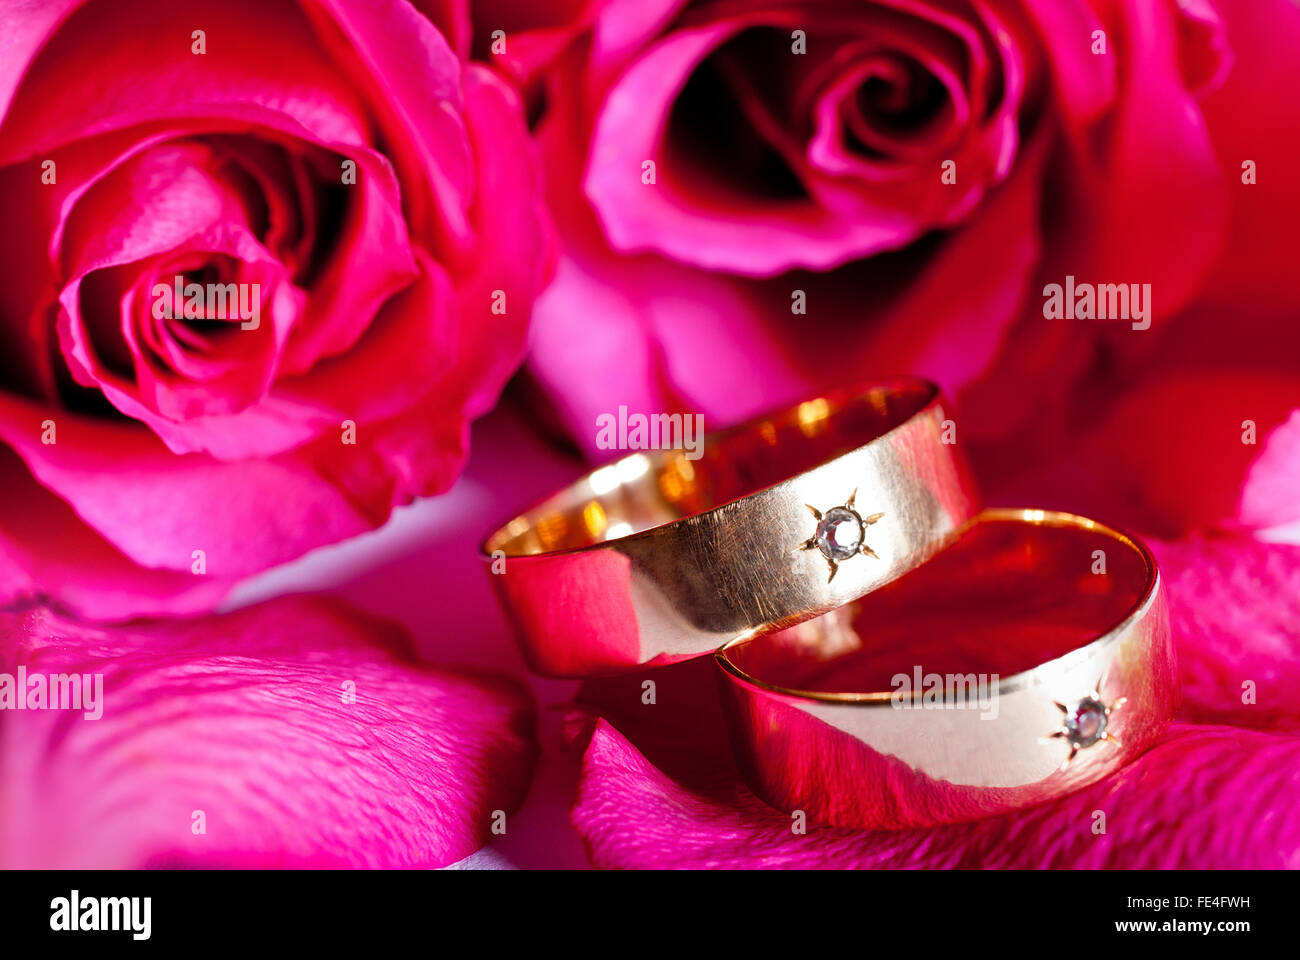 Ring Rose Stock Photos & Ring Rose Stock Images - Alamy